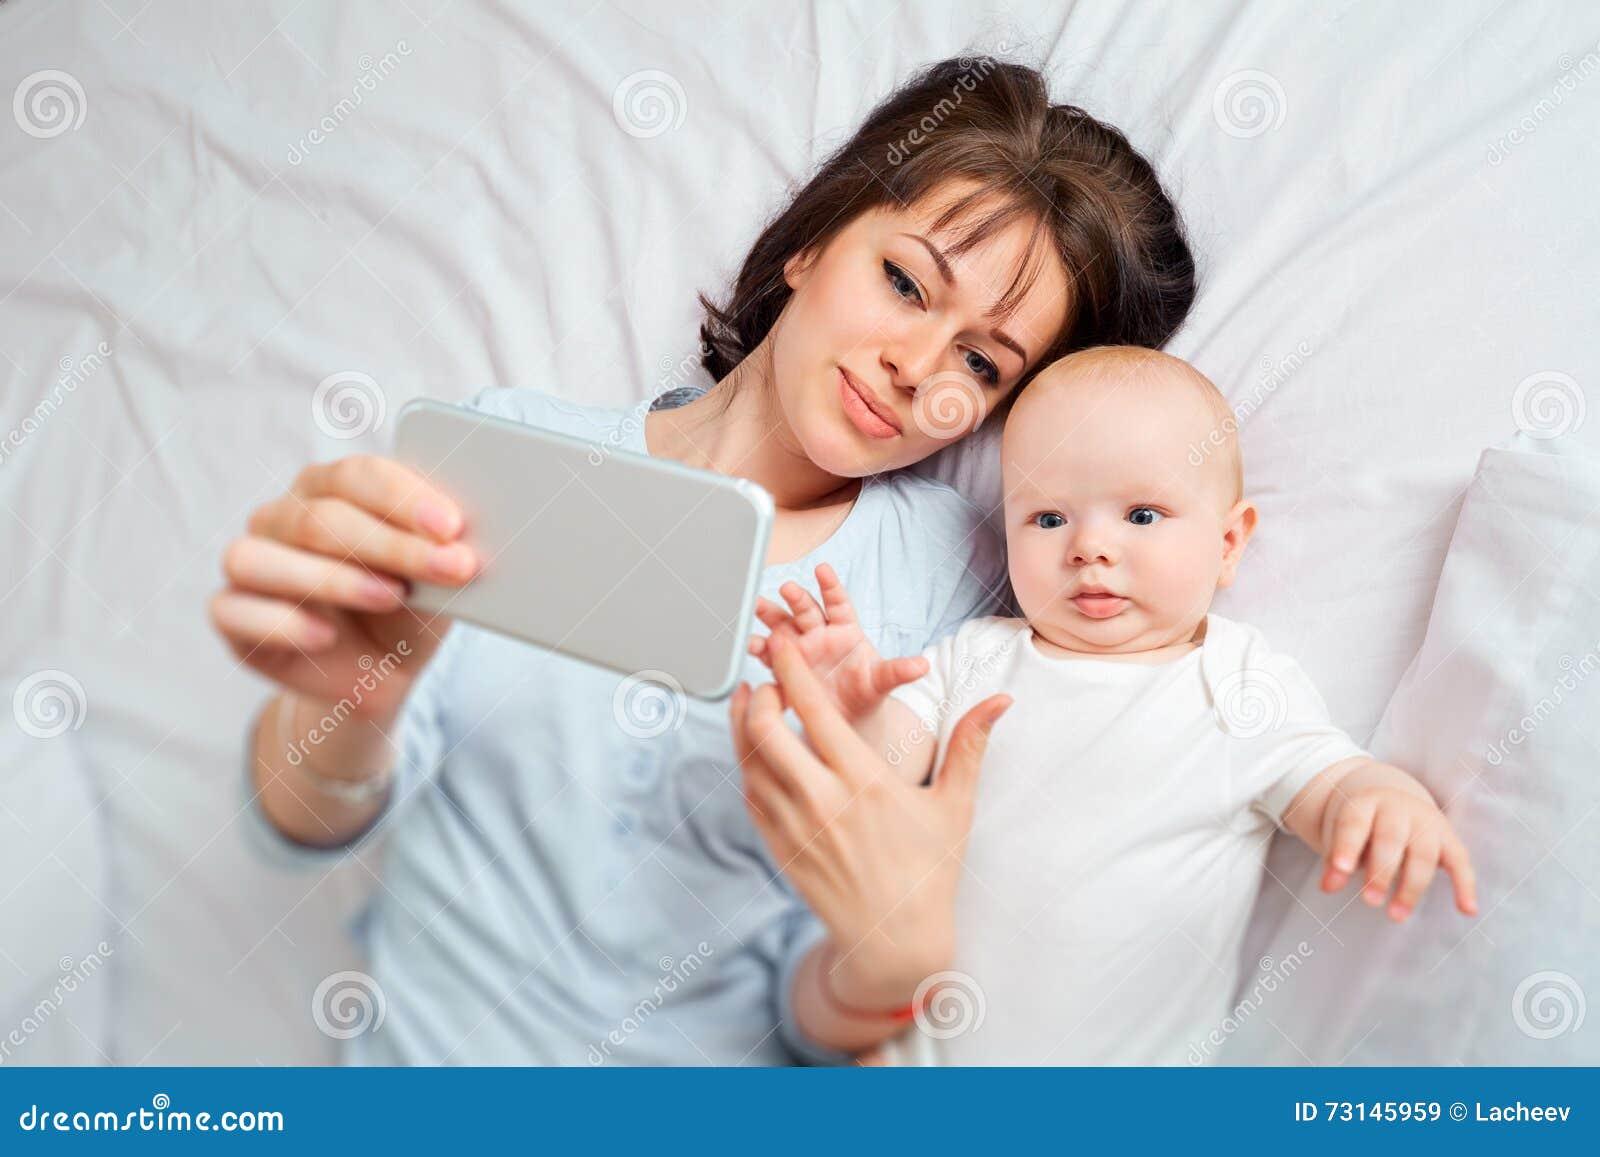 над взглядом Selfie Мама и ребенк с телефоном на b